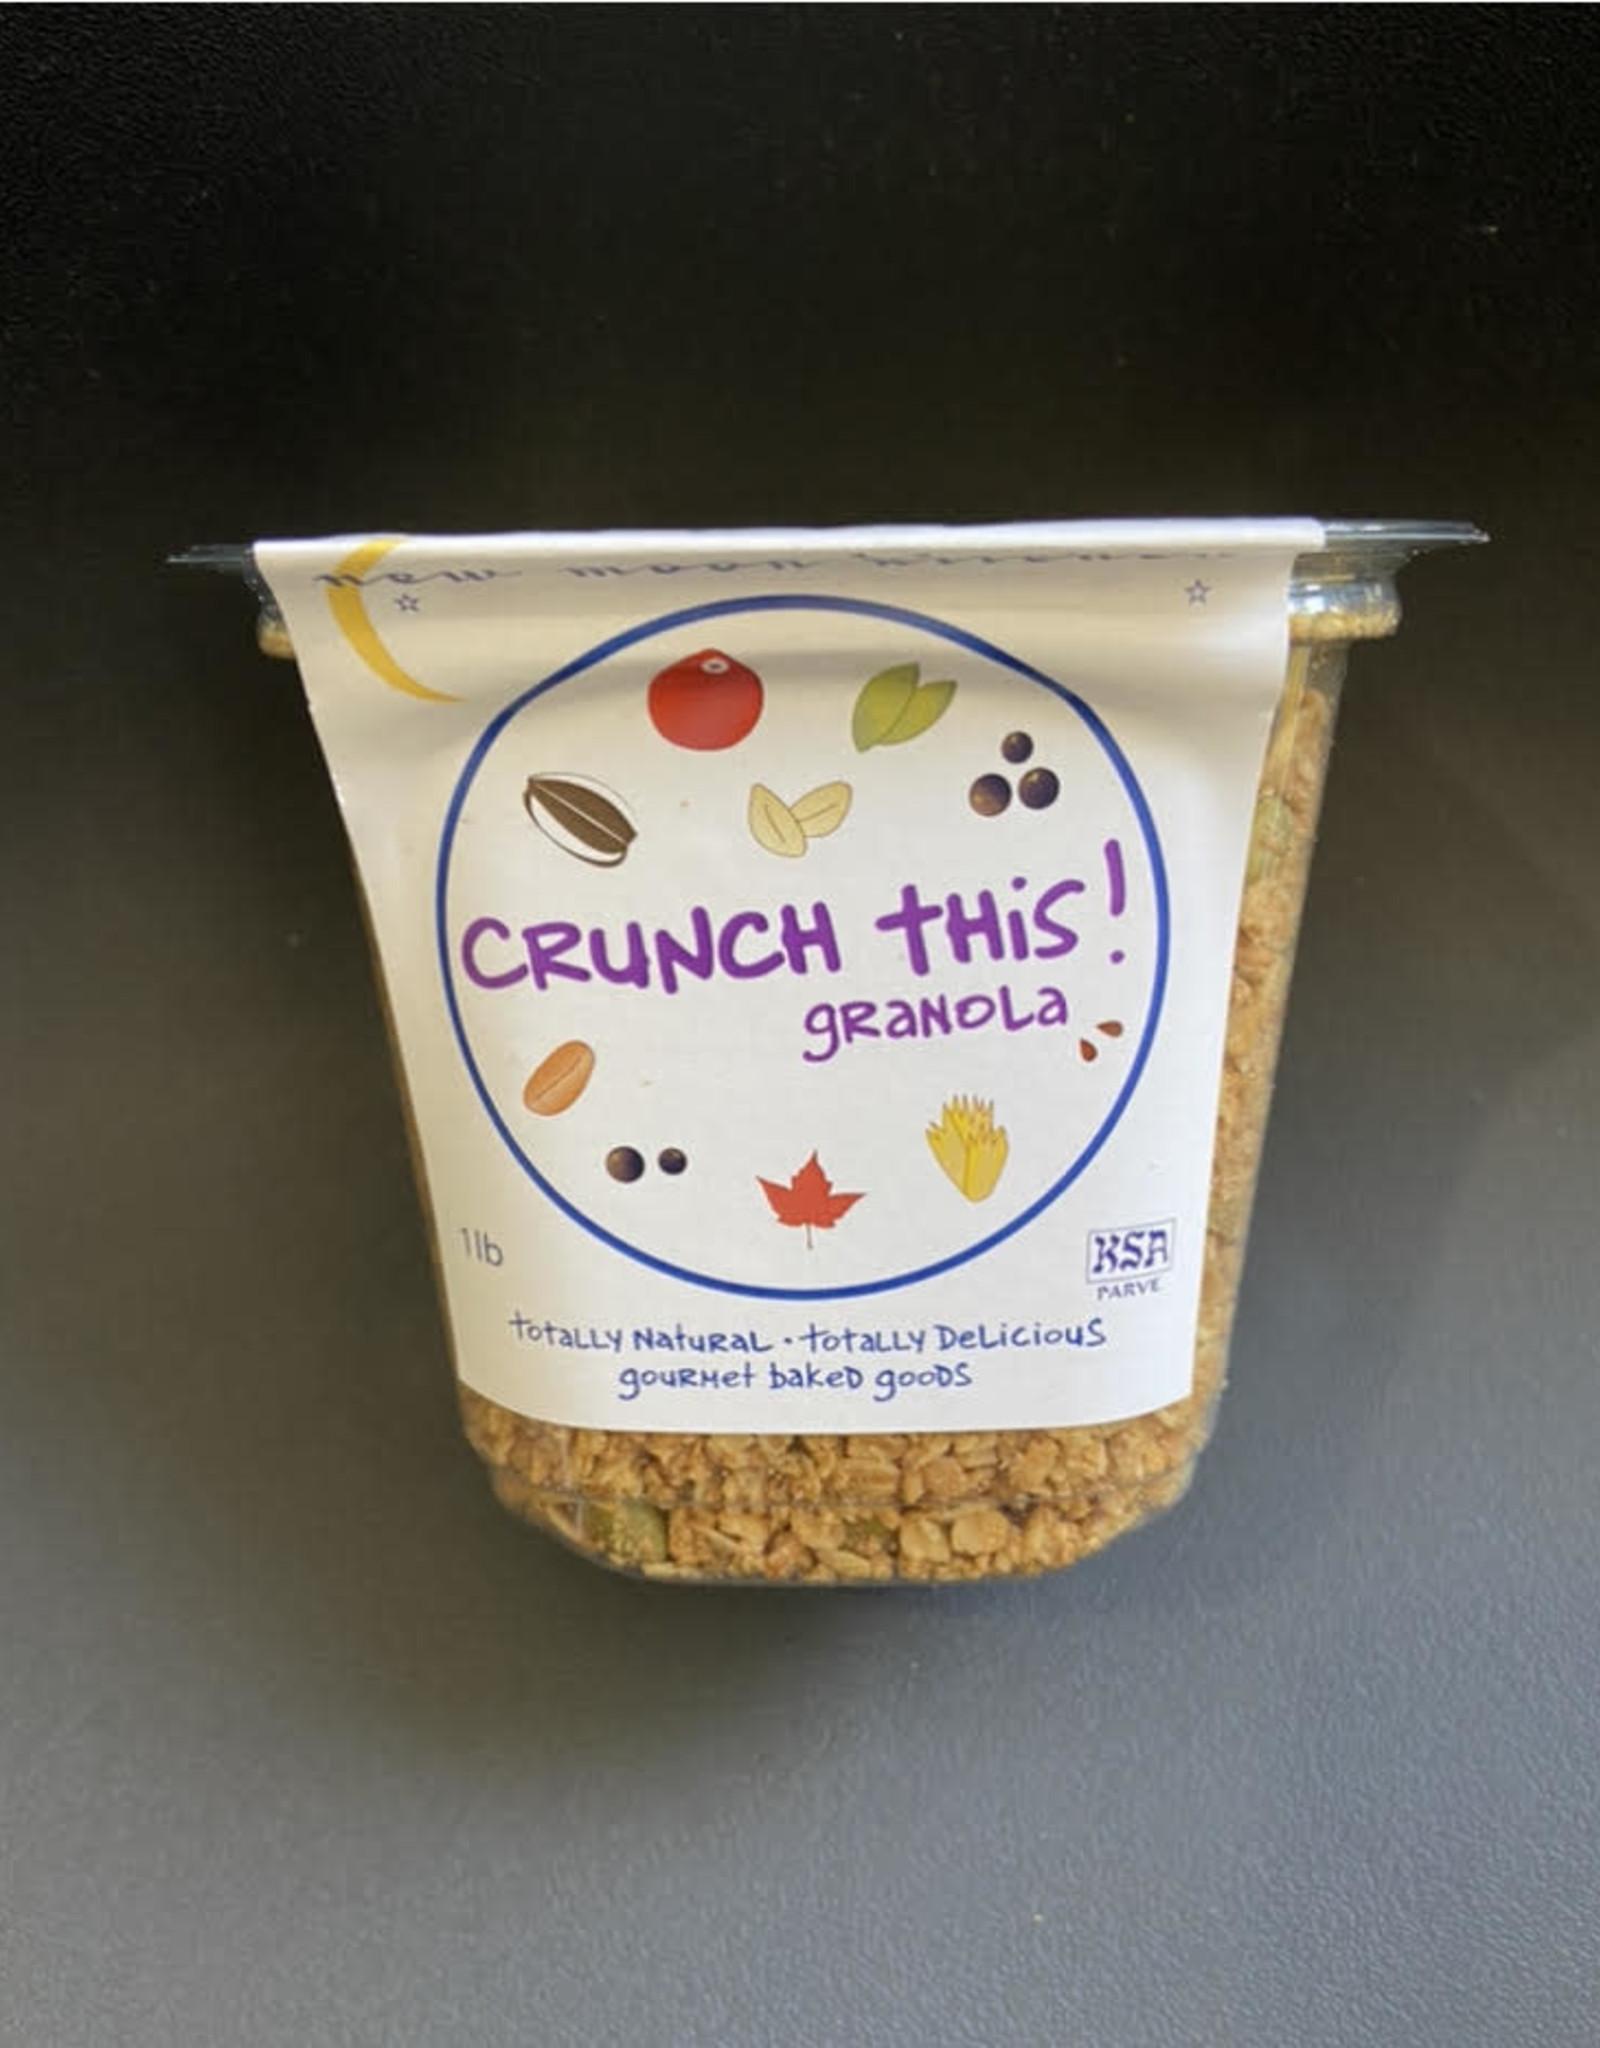 New Moon Kitchen New Moon Kitchen - Crunch the Granola (1lb)